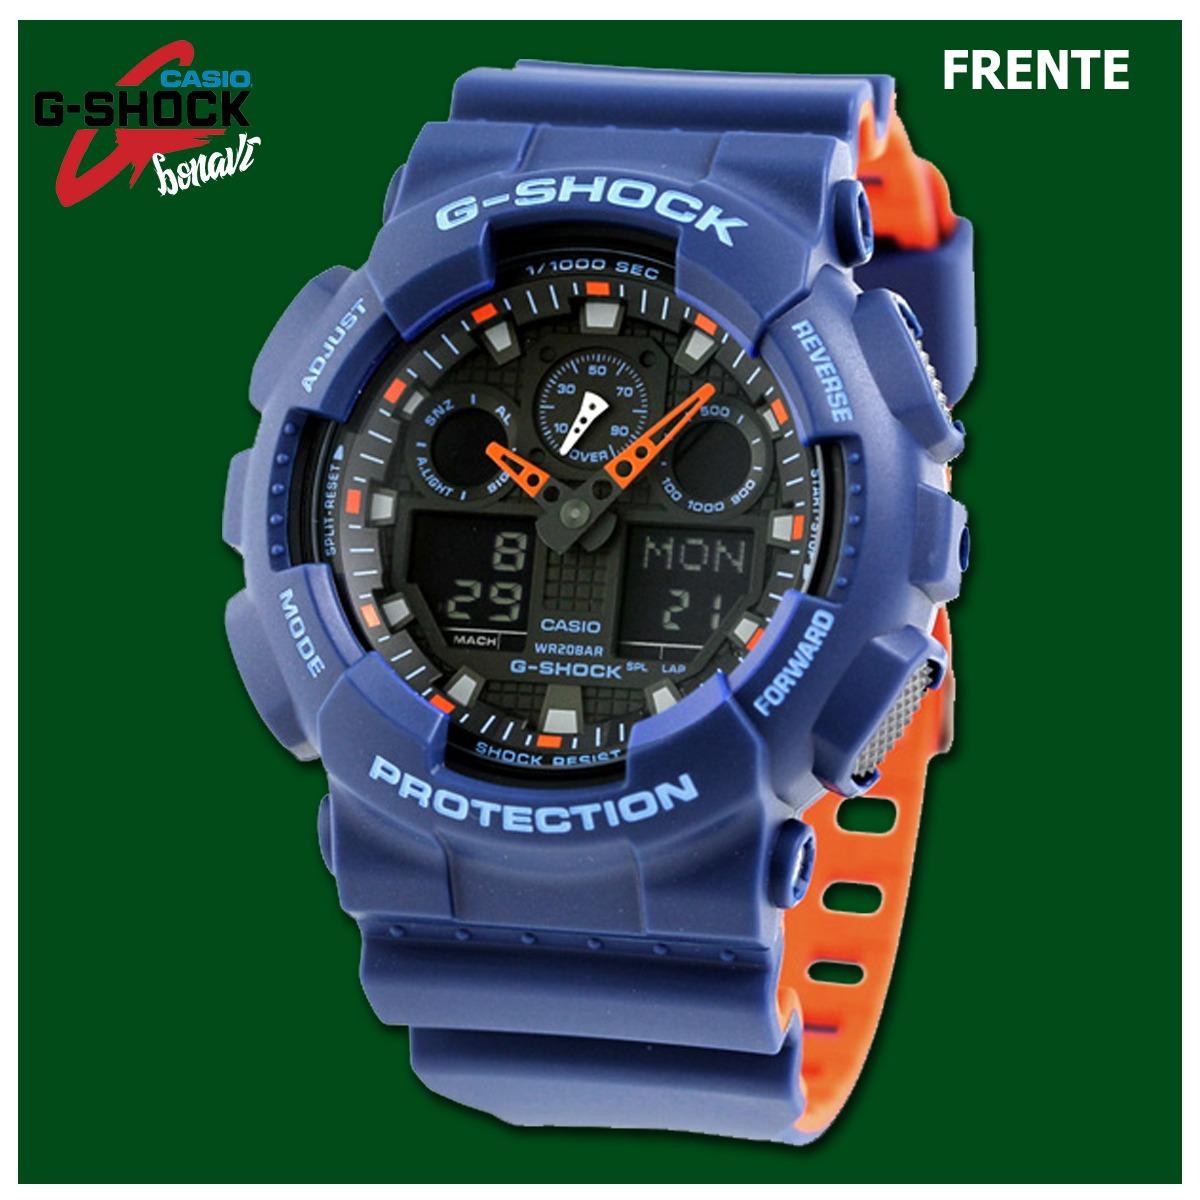 92dddb6537b7 Reloj Casio G-shock Ga-100l-4a (azul Eléctrico) - Nuevo -   371.500 ...